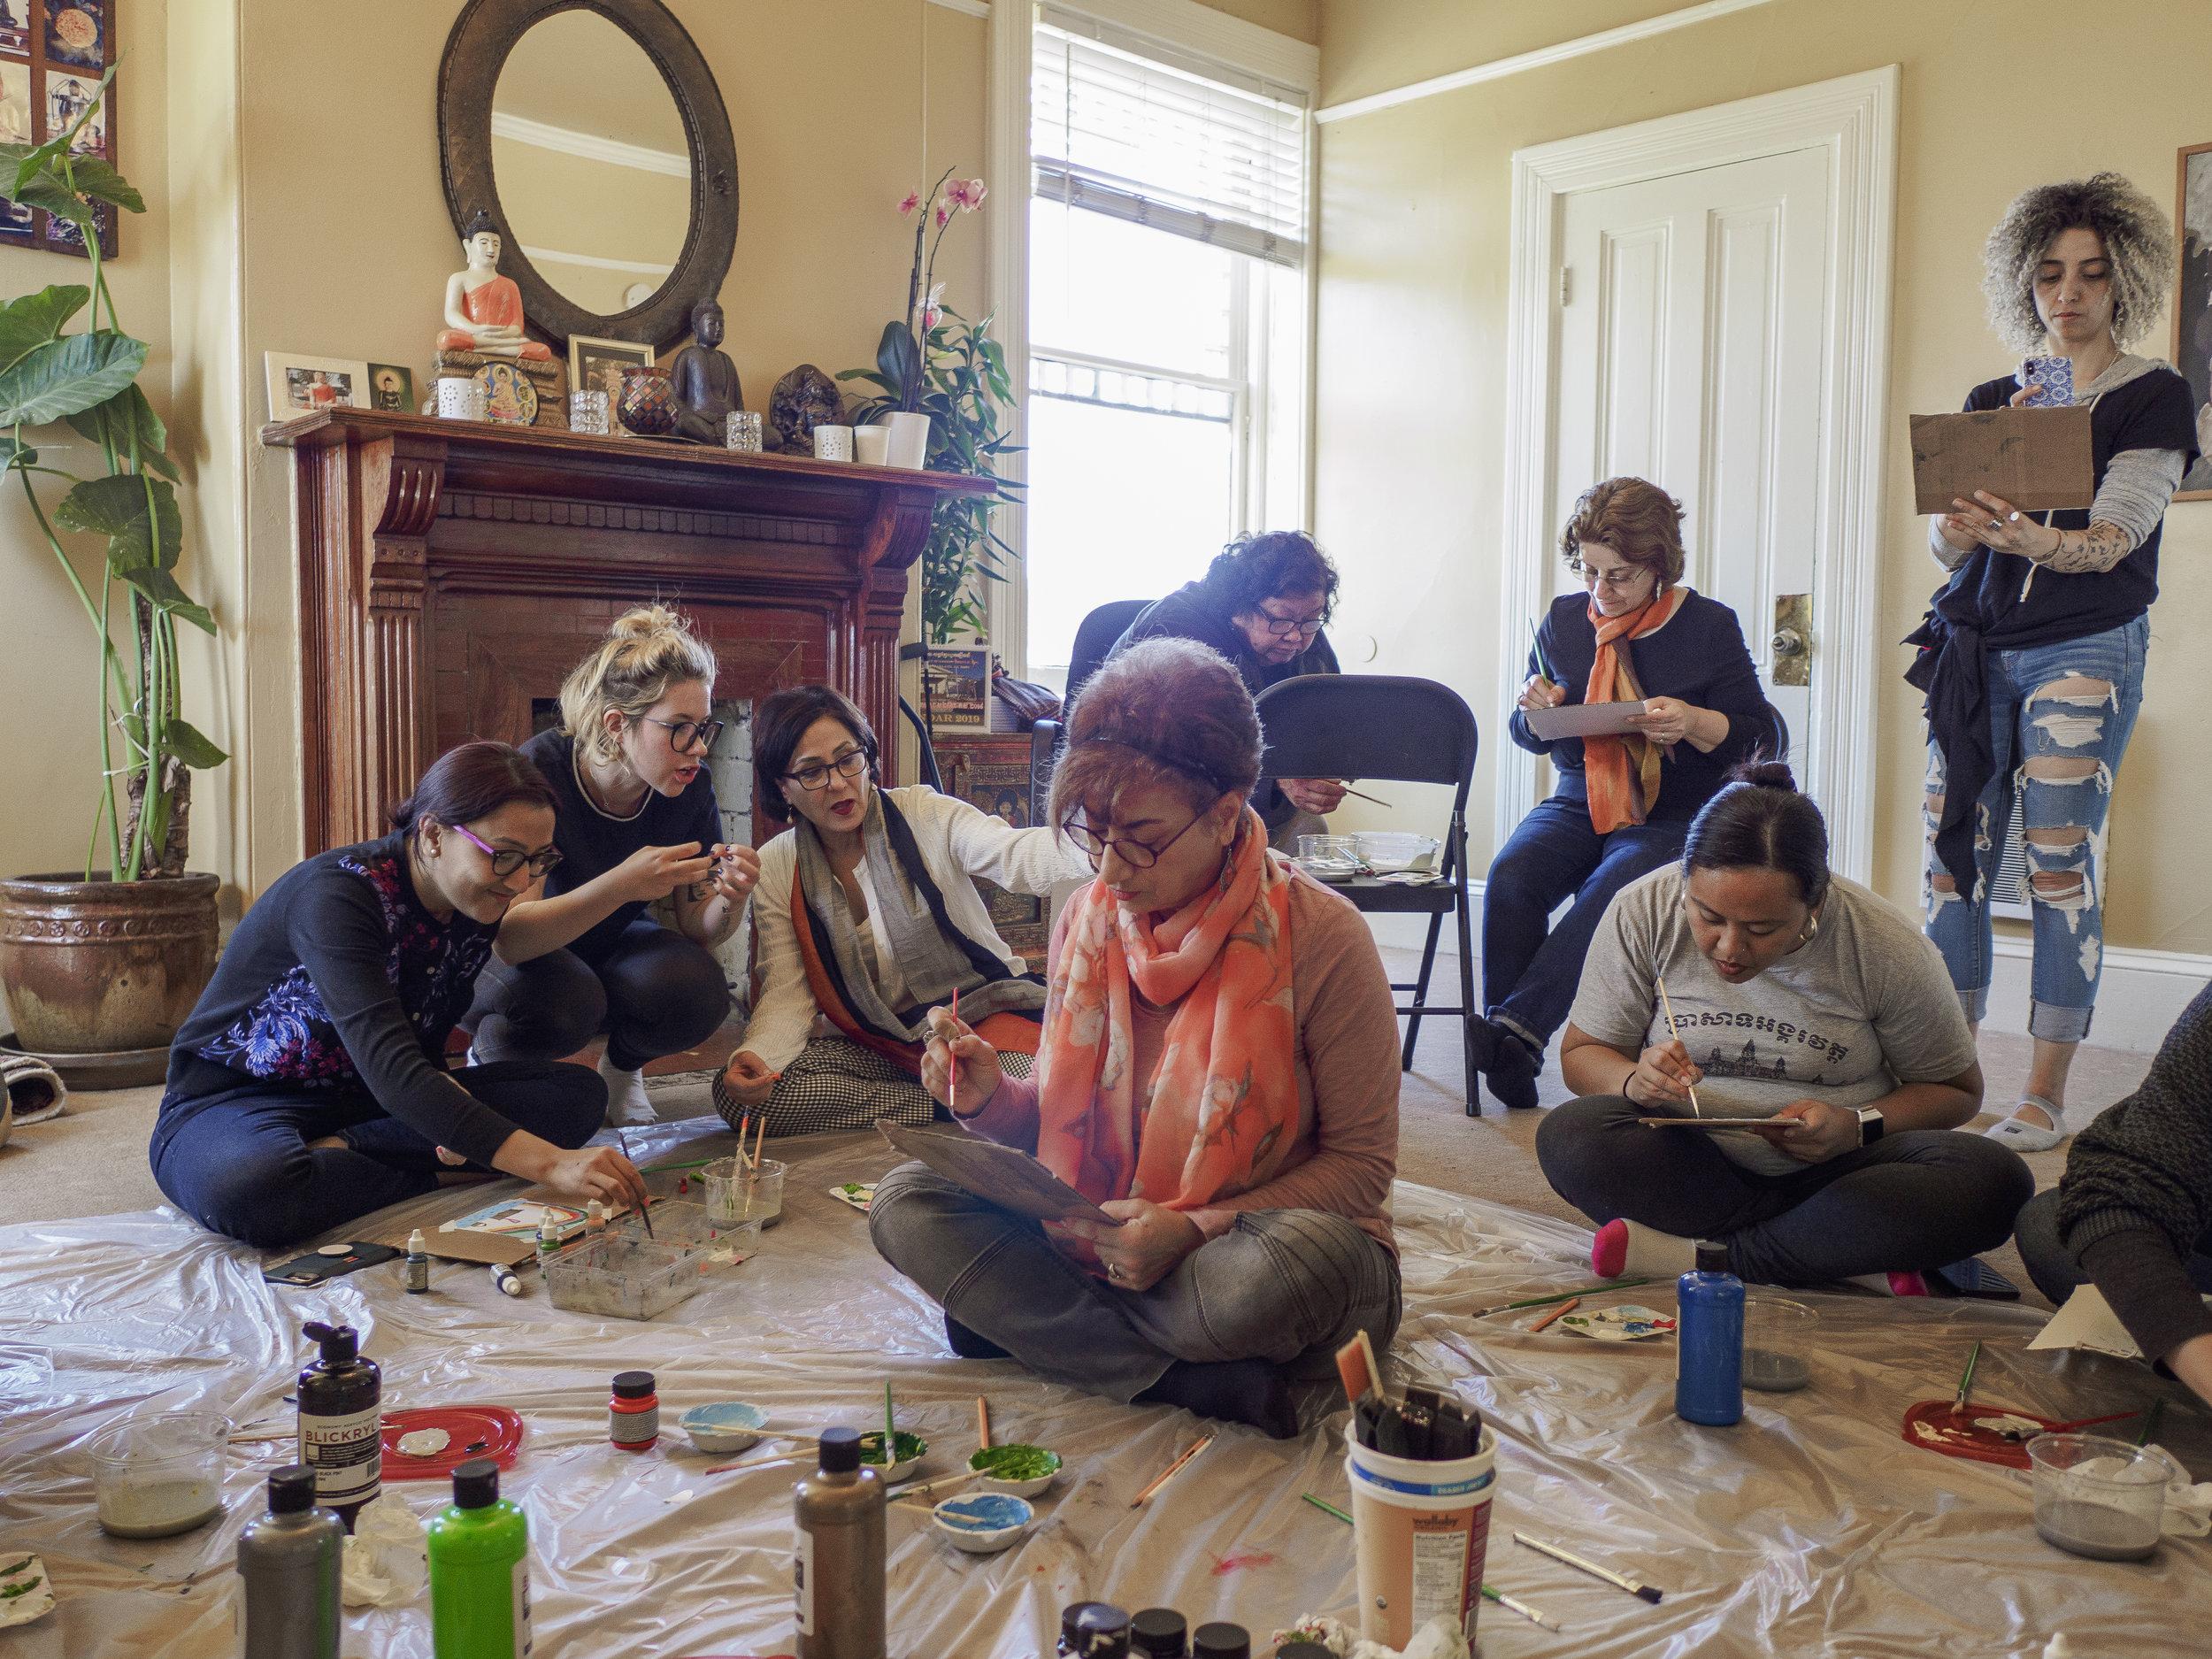 fabric-painting-artogether-women-4.jpg